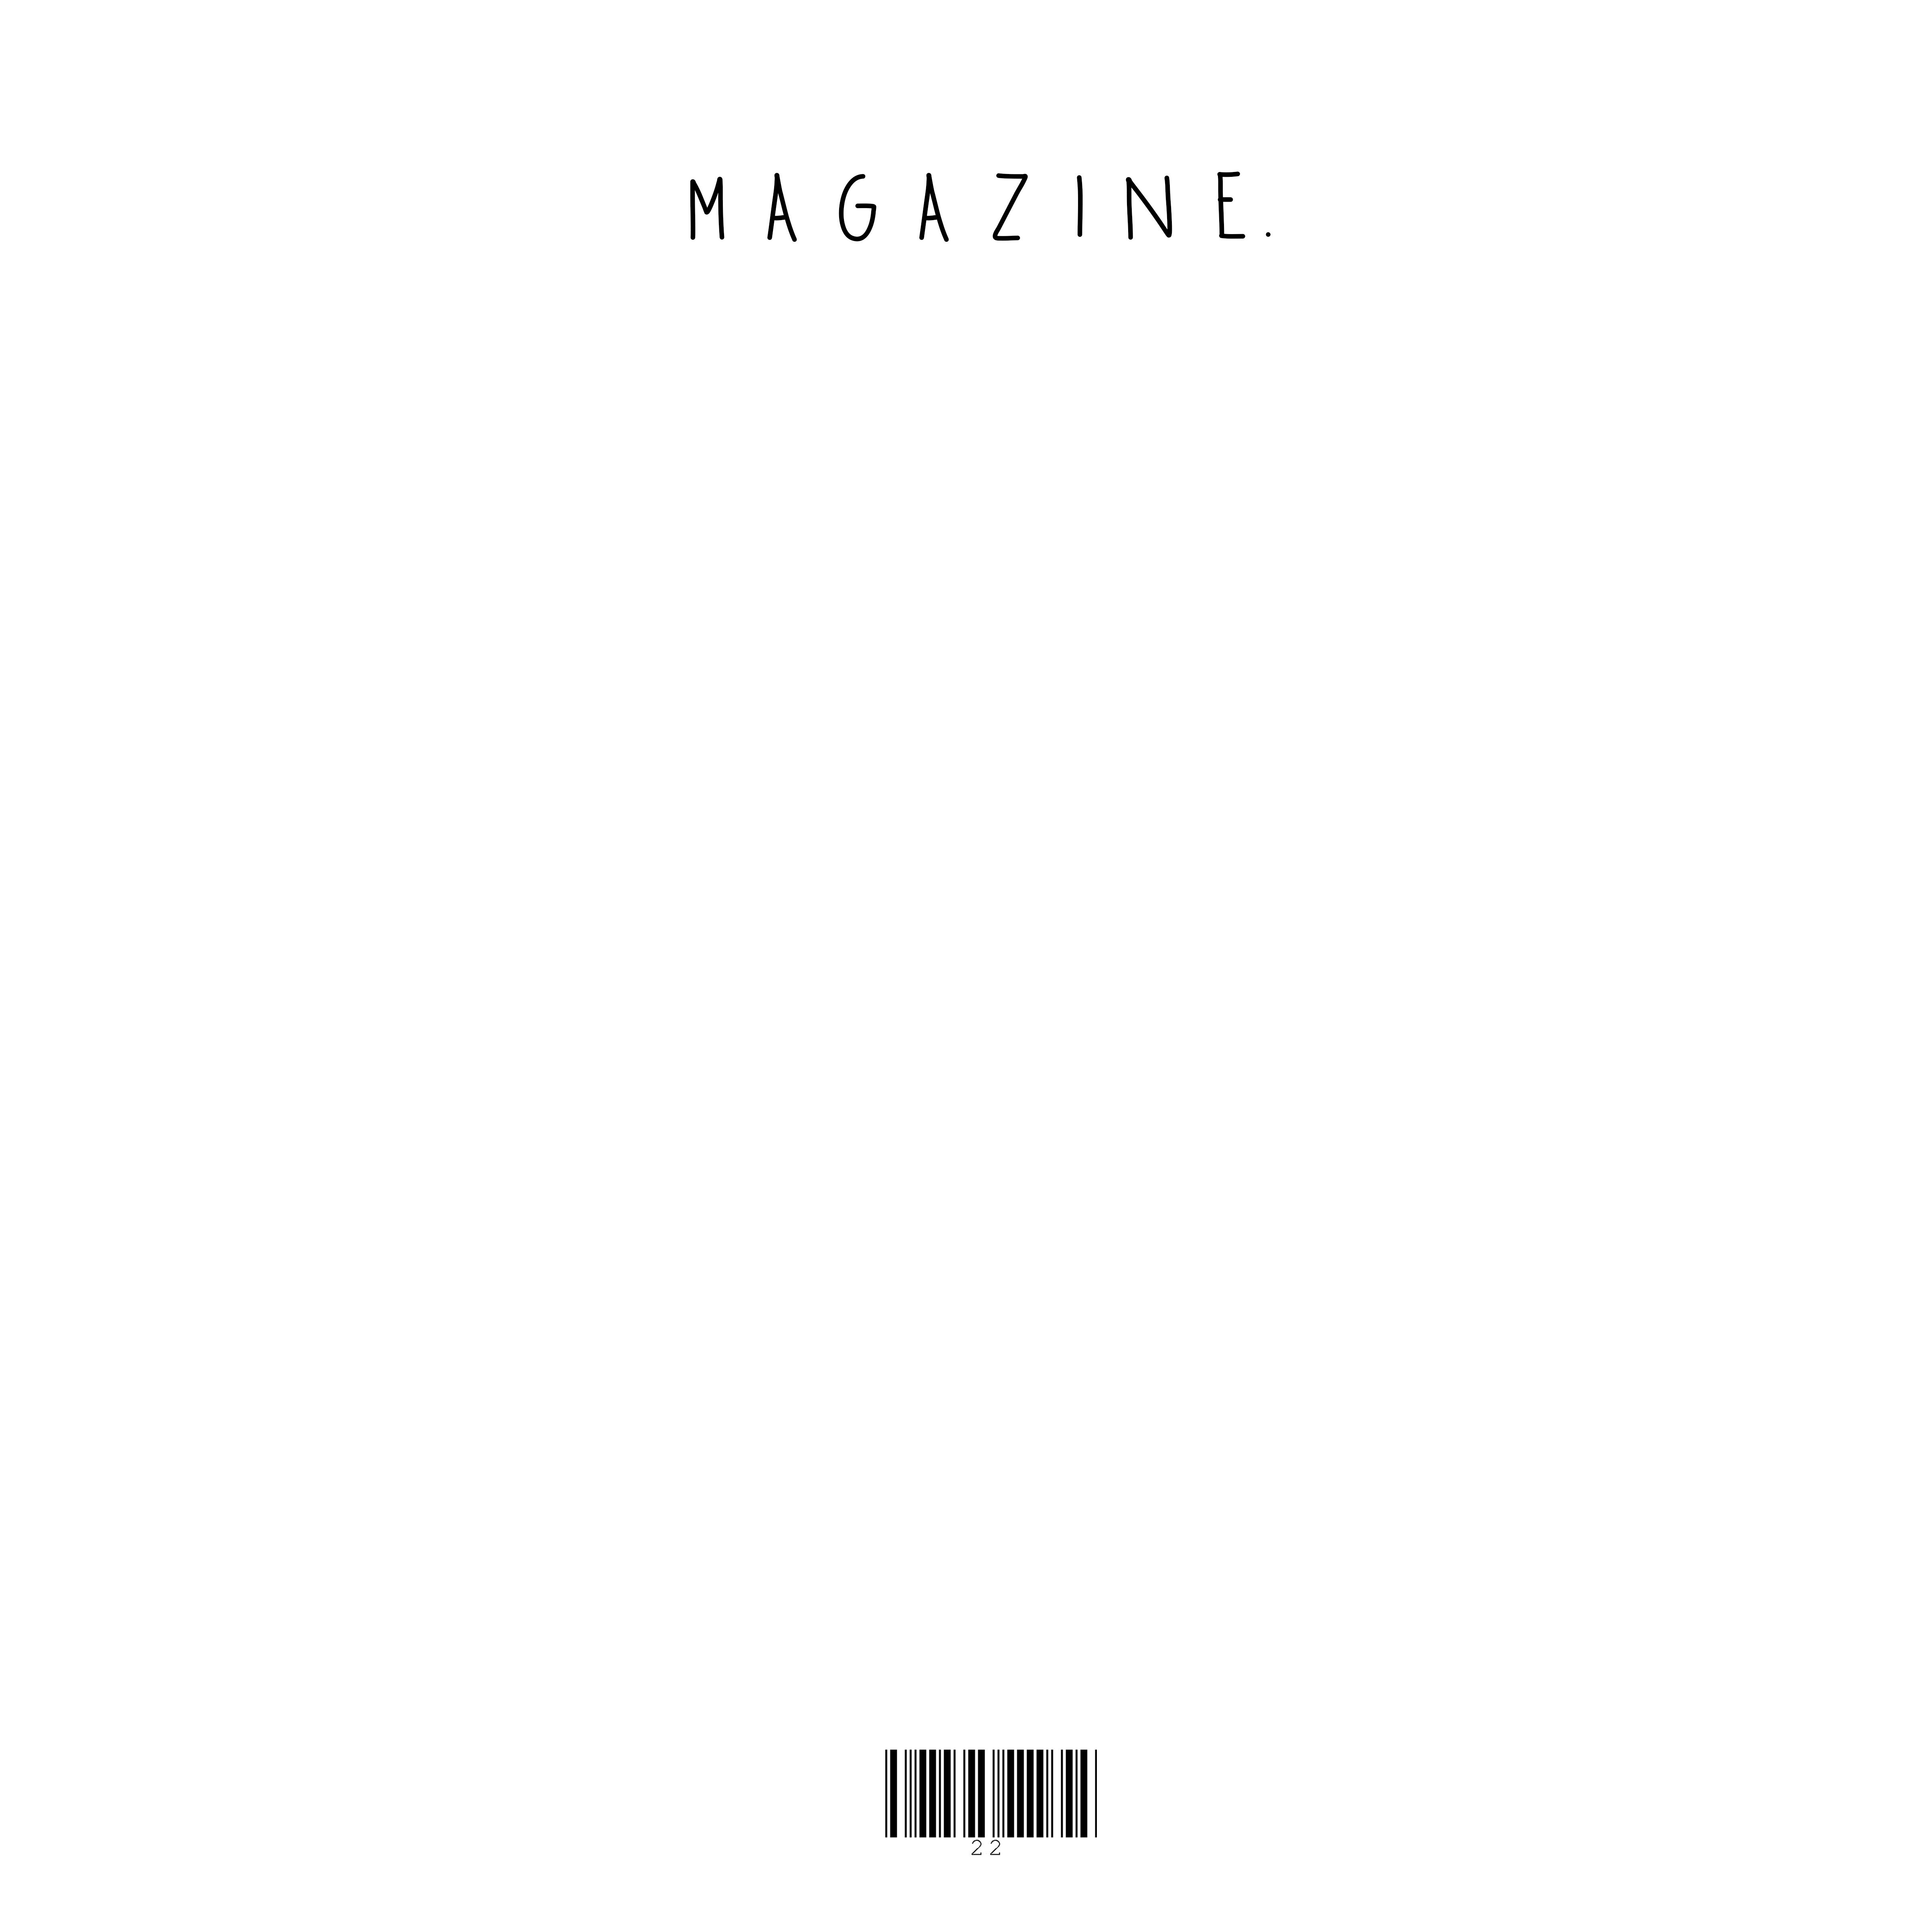 Jowners - Magazine